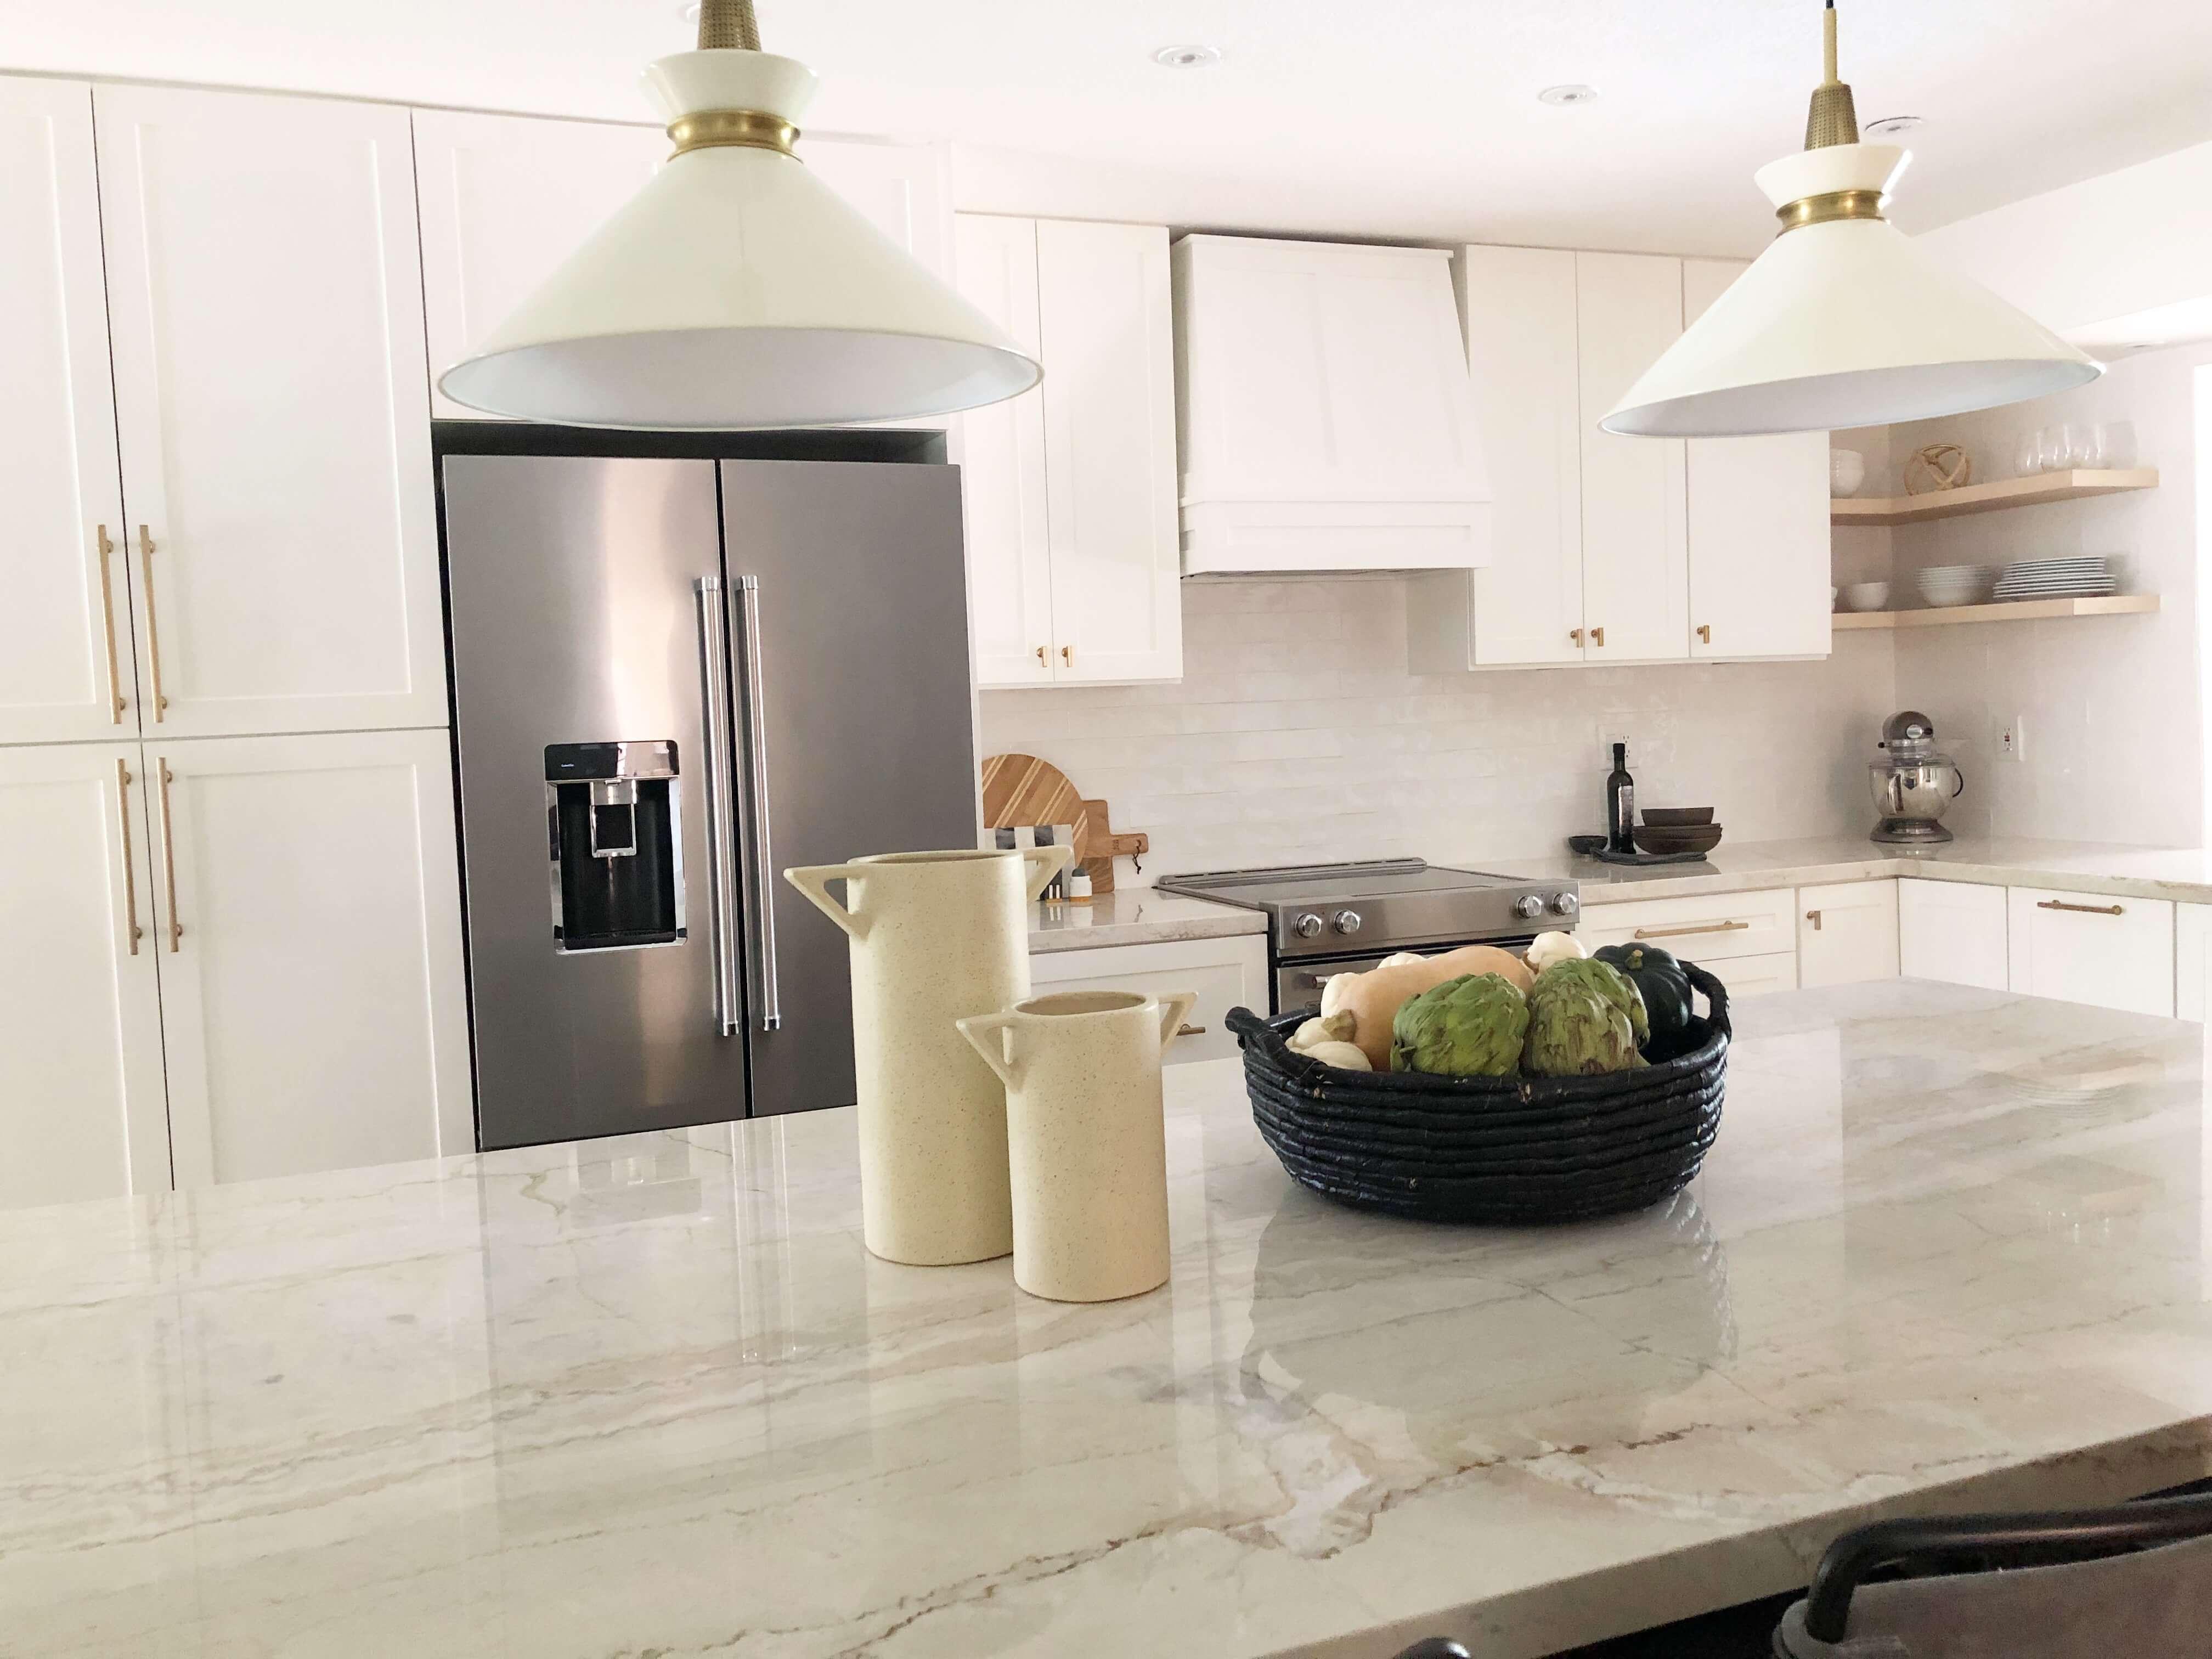 White Kitchen Renovation - Interior Design Companies in Fort Lauderdale